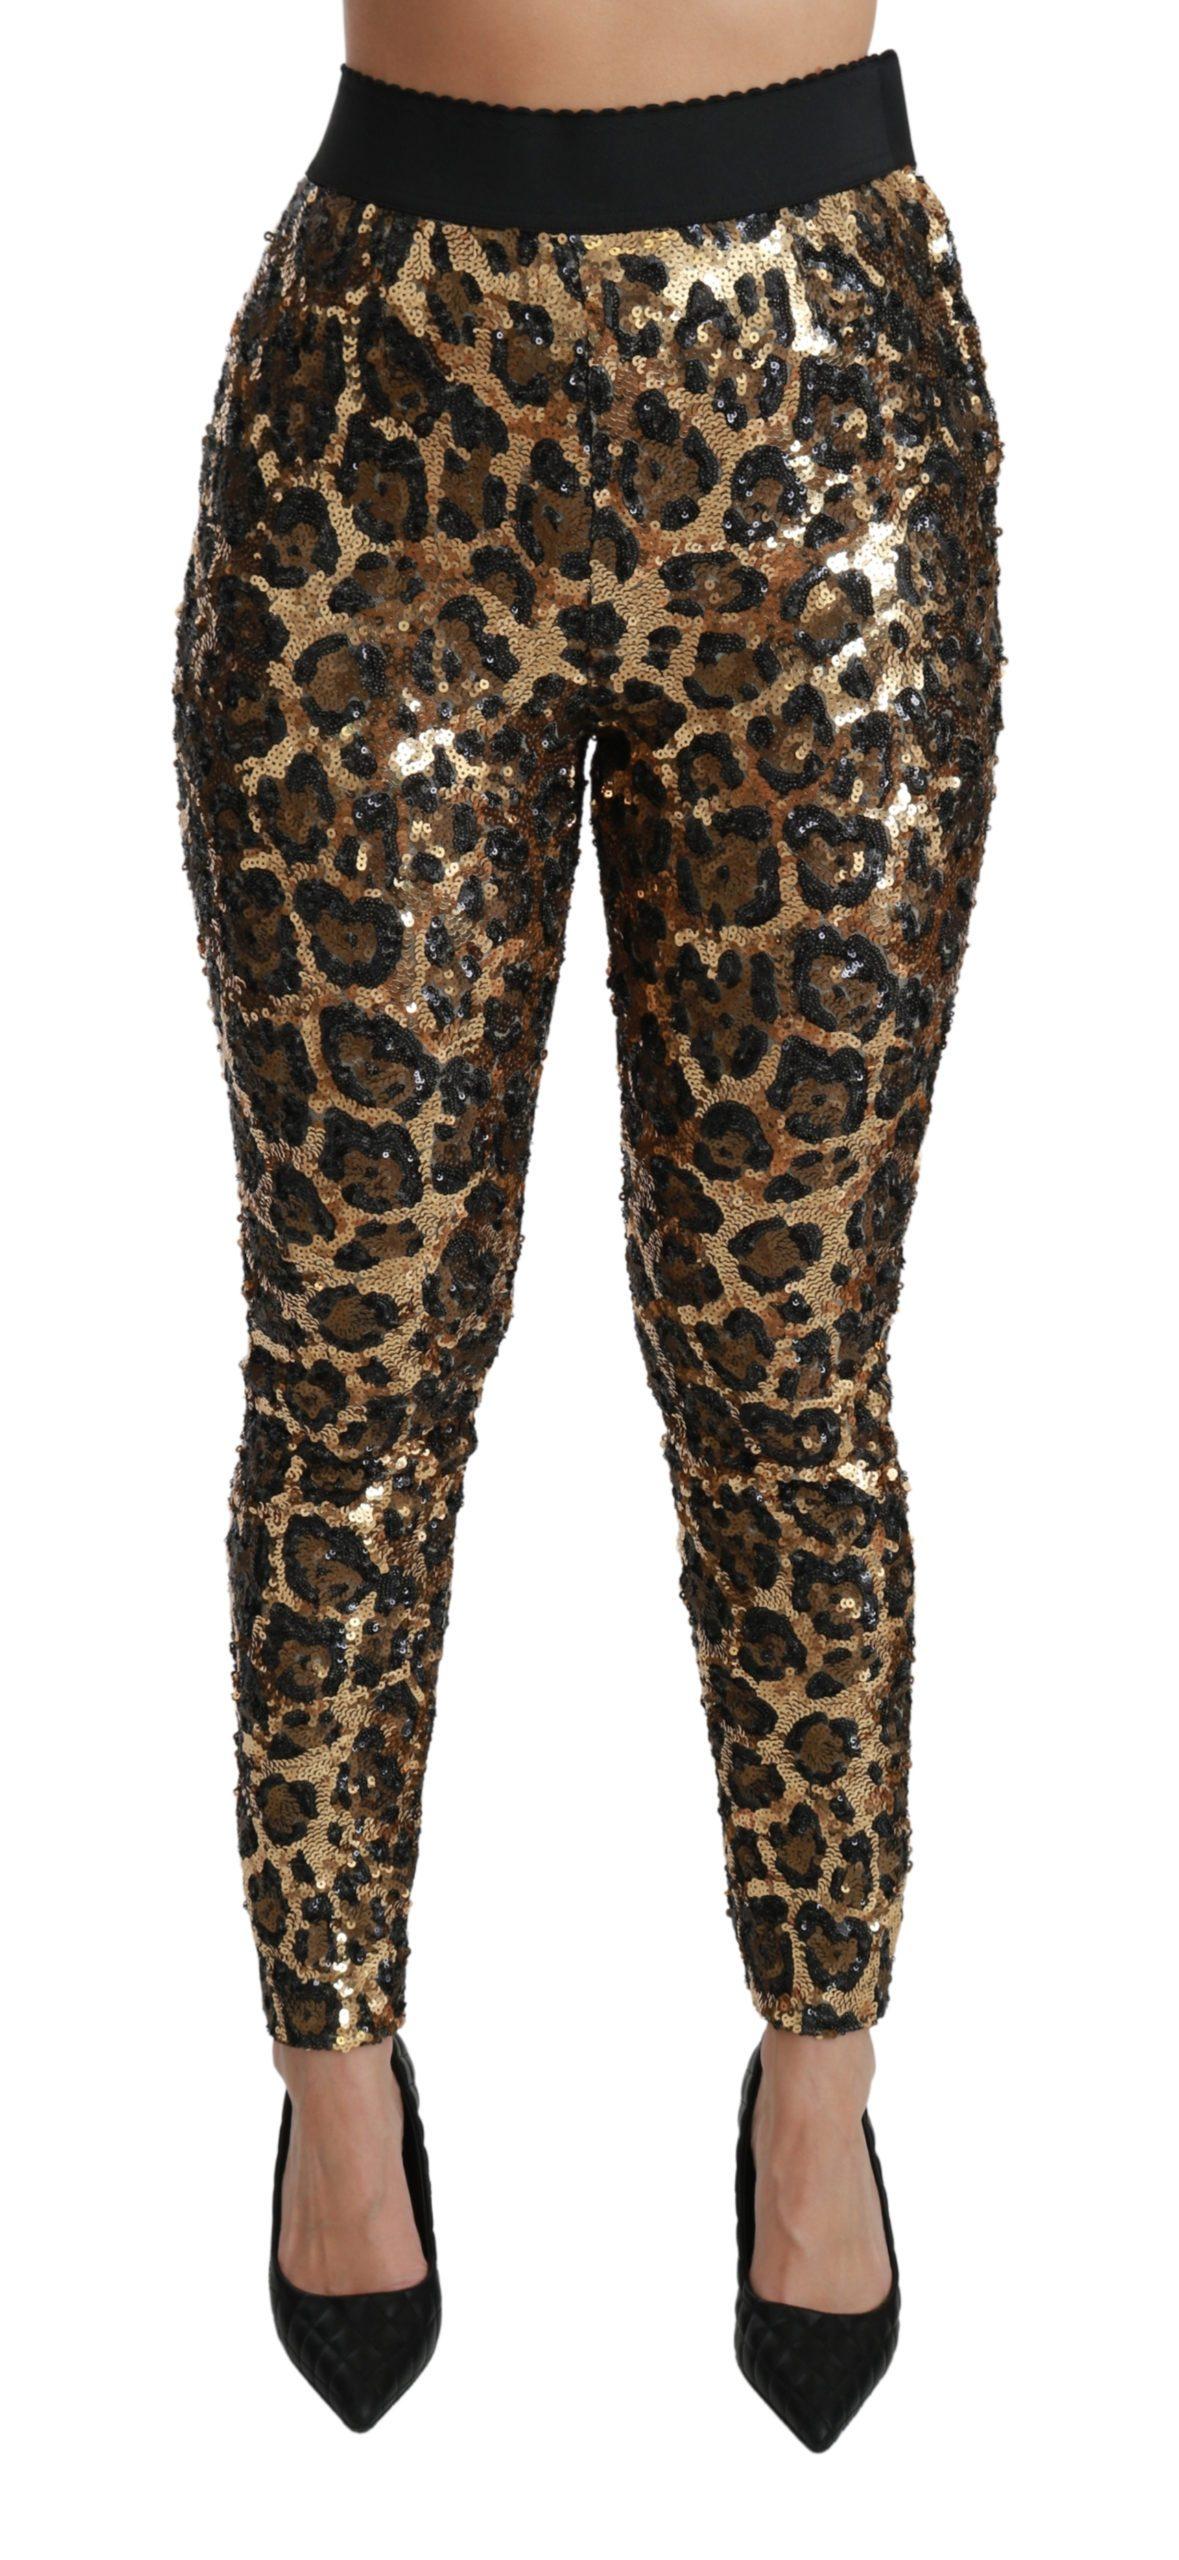 Dolce & Gabbana Women's Leopard Sequined Legging Trouser Brown PAN70932 - IT40|S